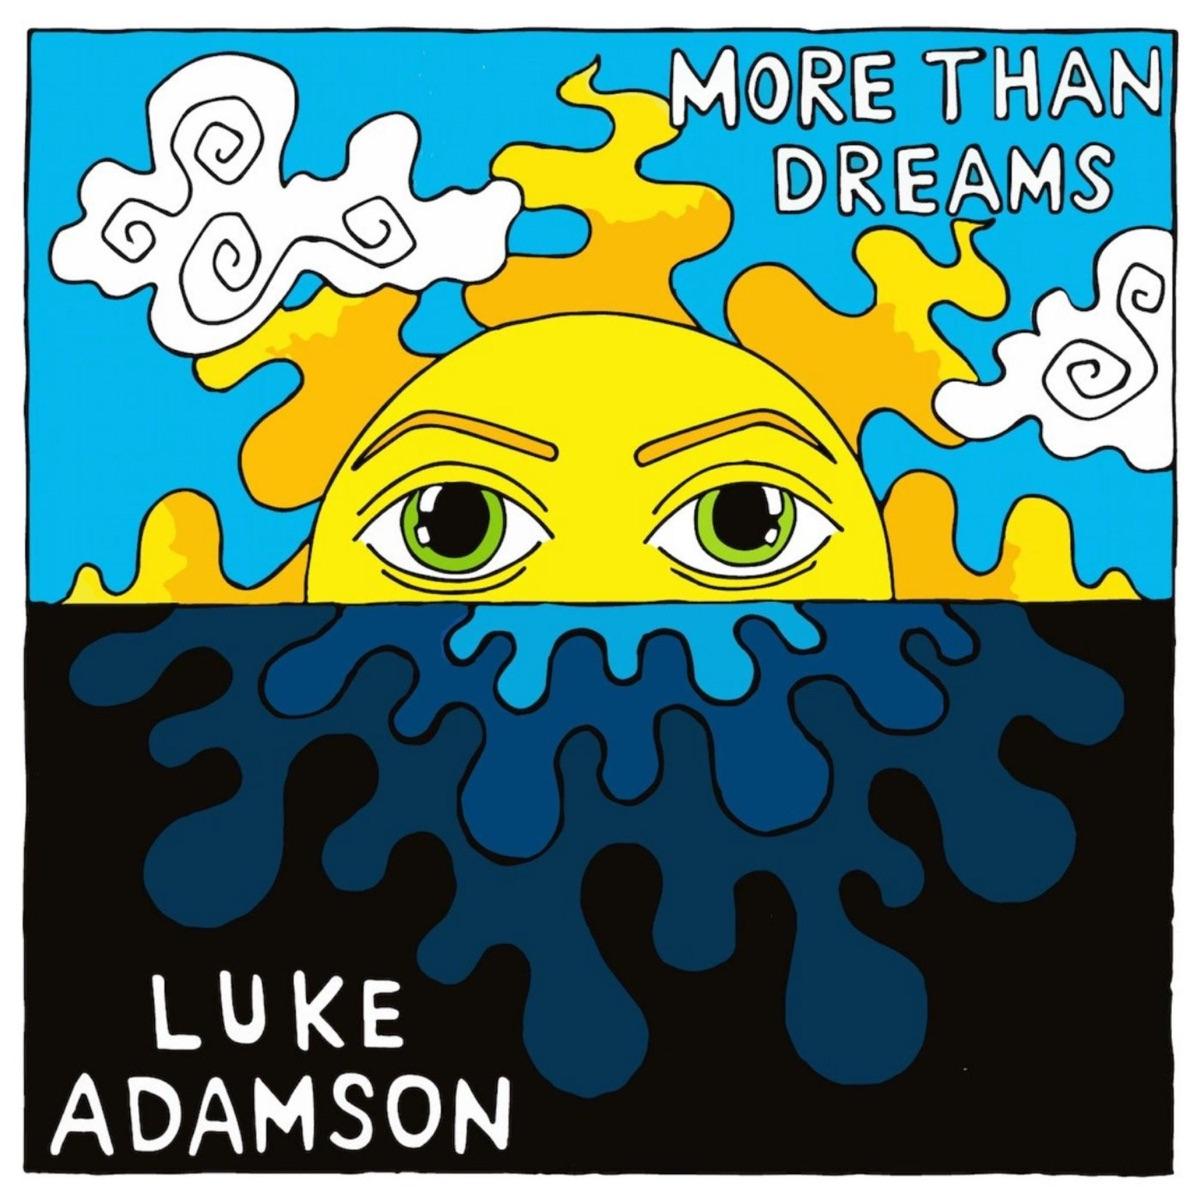 More Than Dreams - Single Luke Adamson CD cover